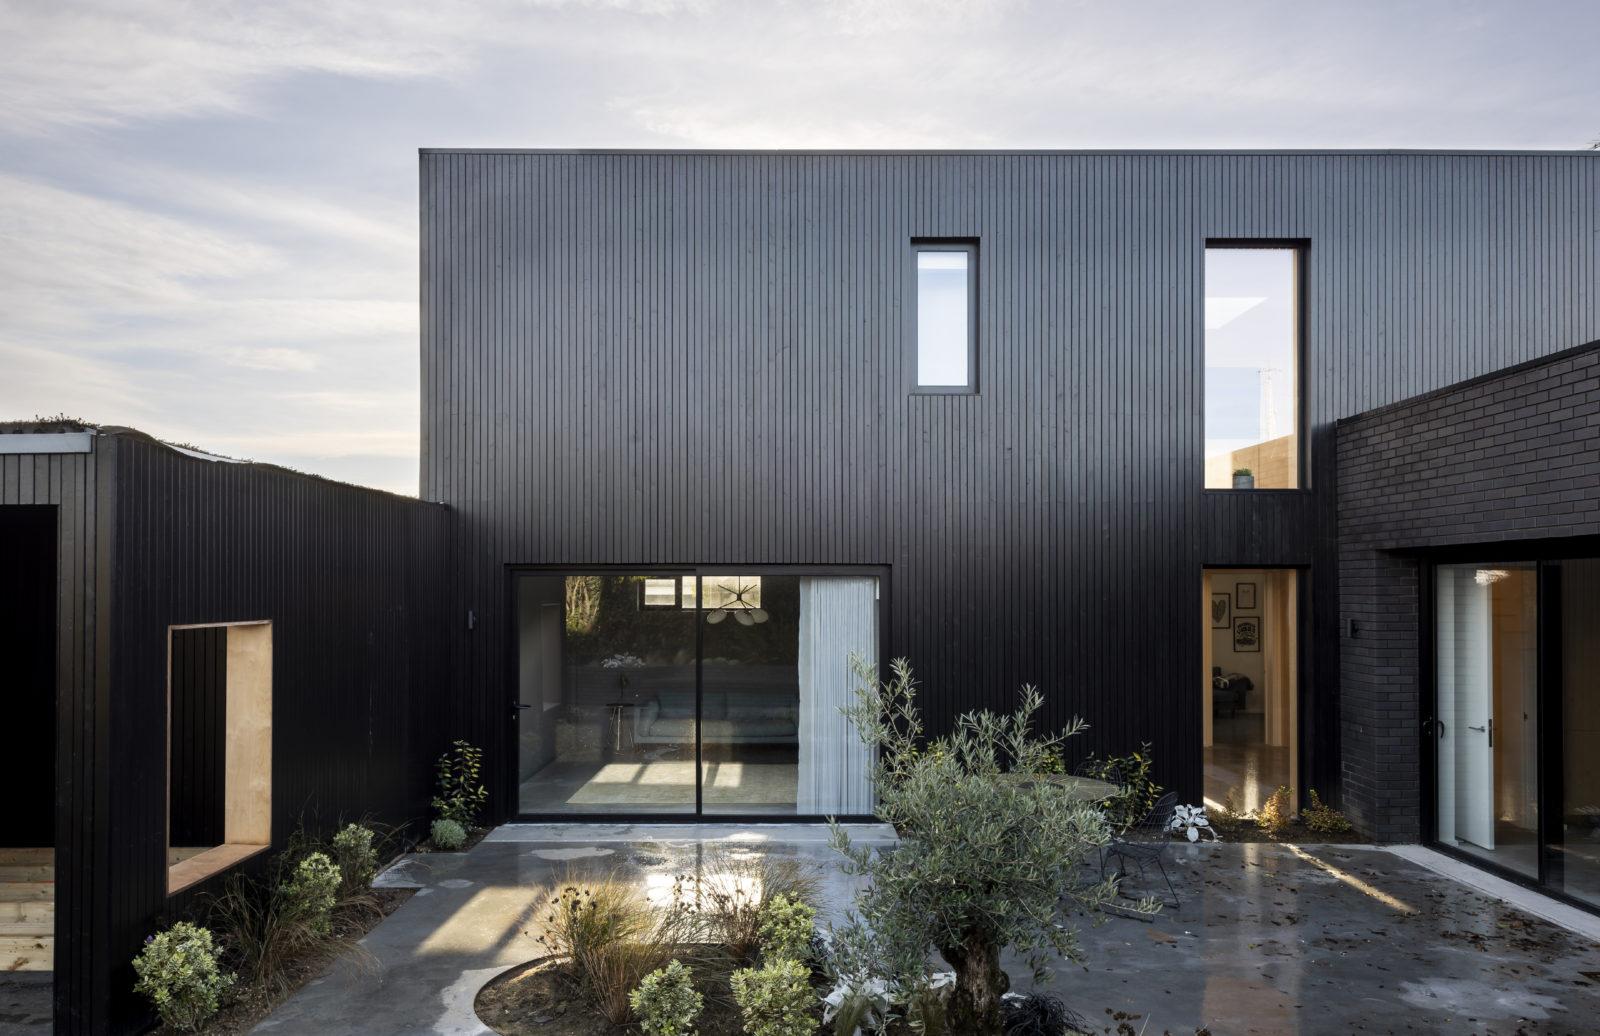 Coastal Kent retreat Flint House has black patterned brickwork